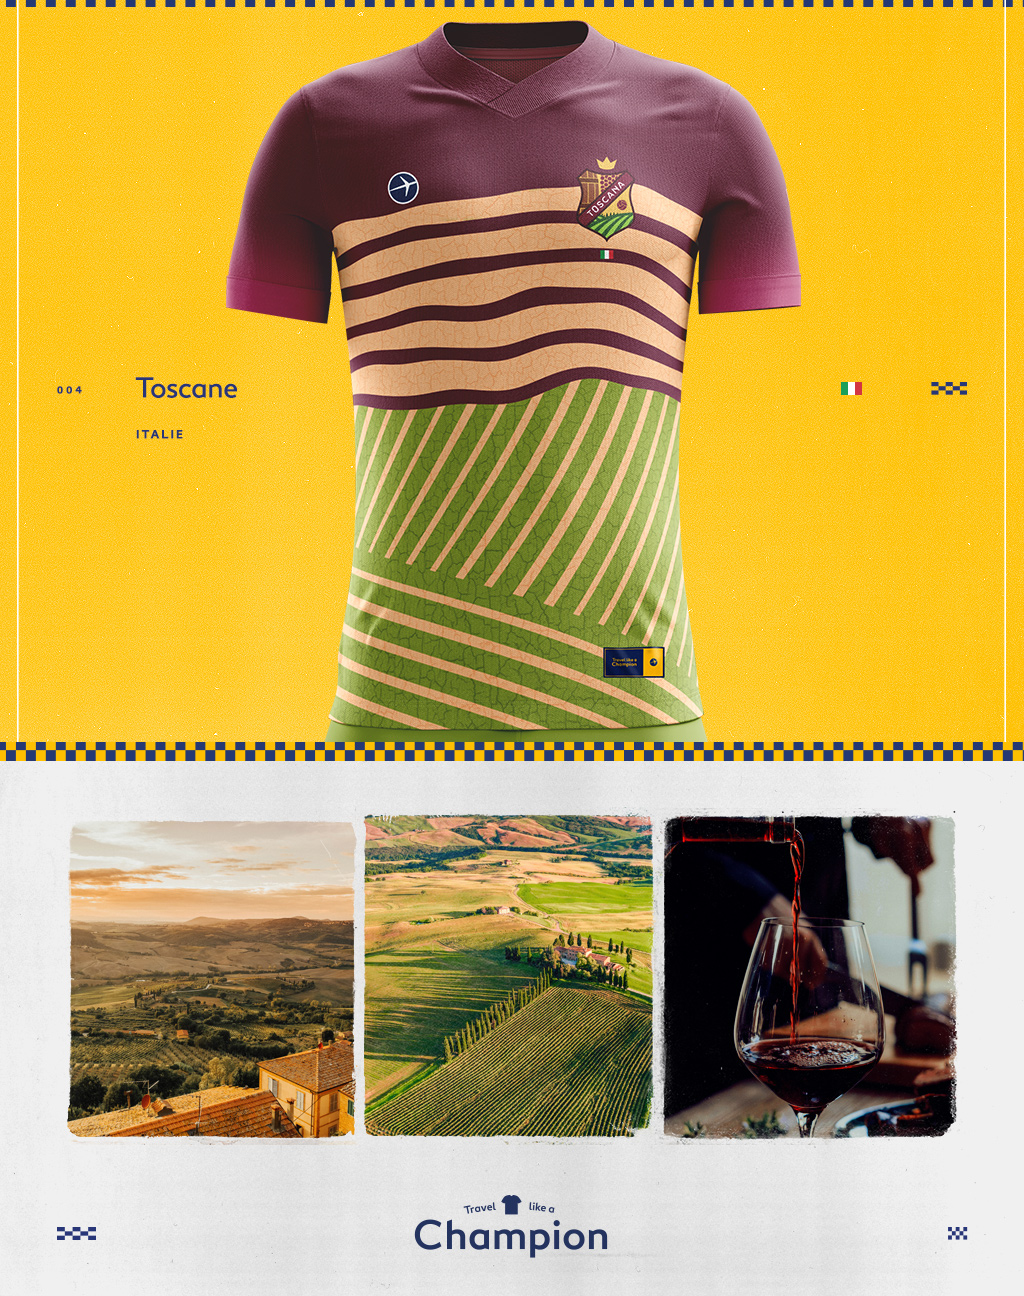 004-toscana-blog-article-1024x1296-fr.jpg?1556232010